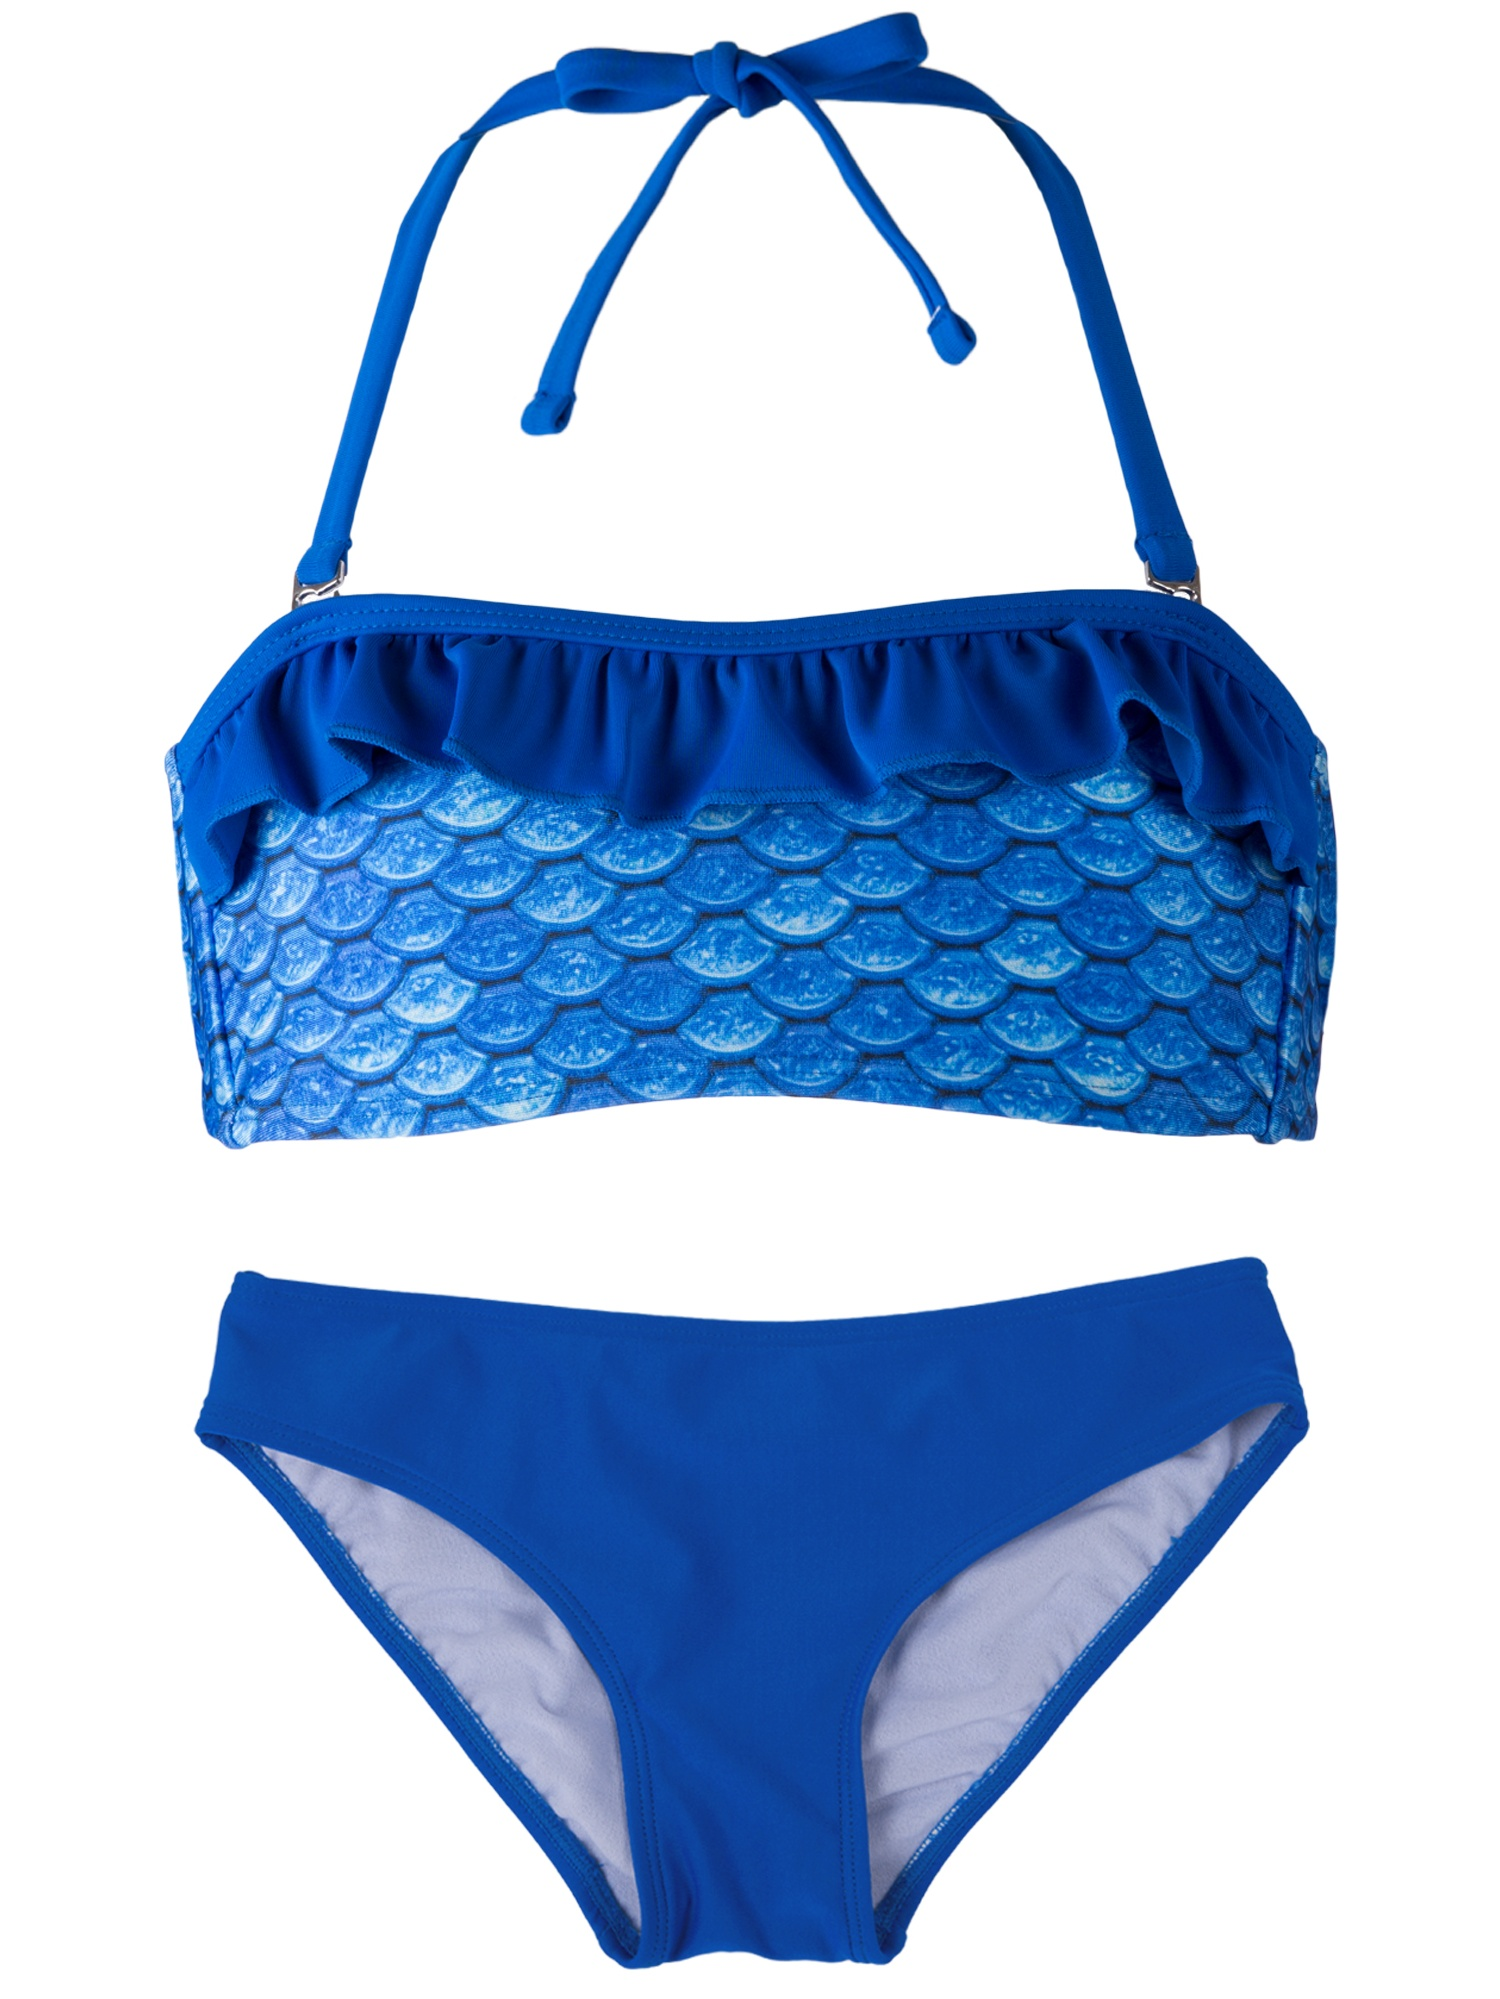 Girls Bandeau Bikini Set by Fin Fun, Matches Fin Fun Mermaid Tails